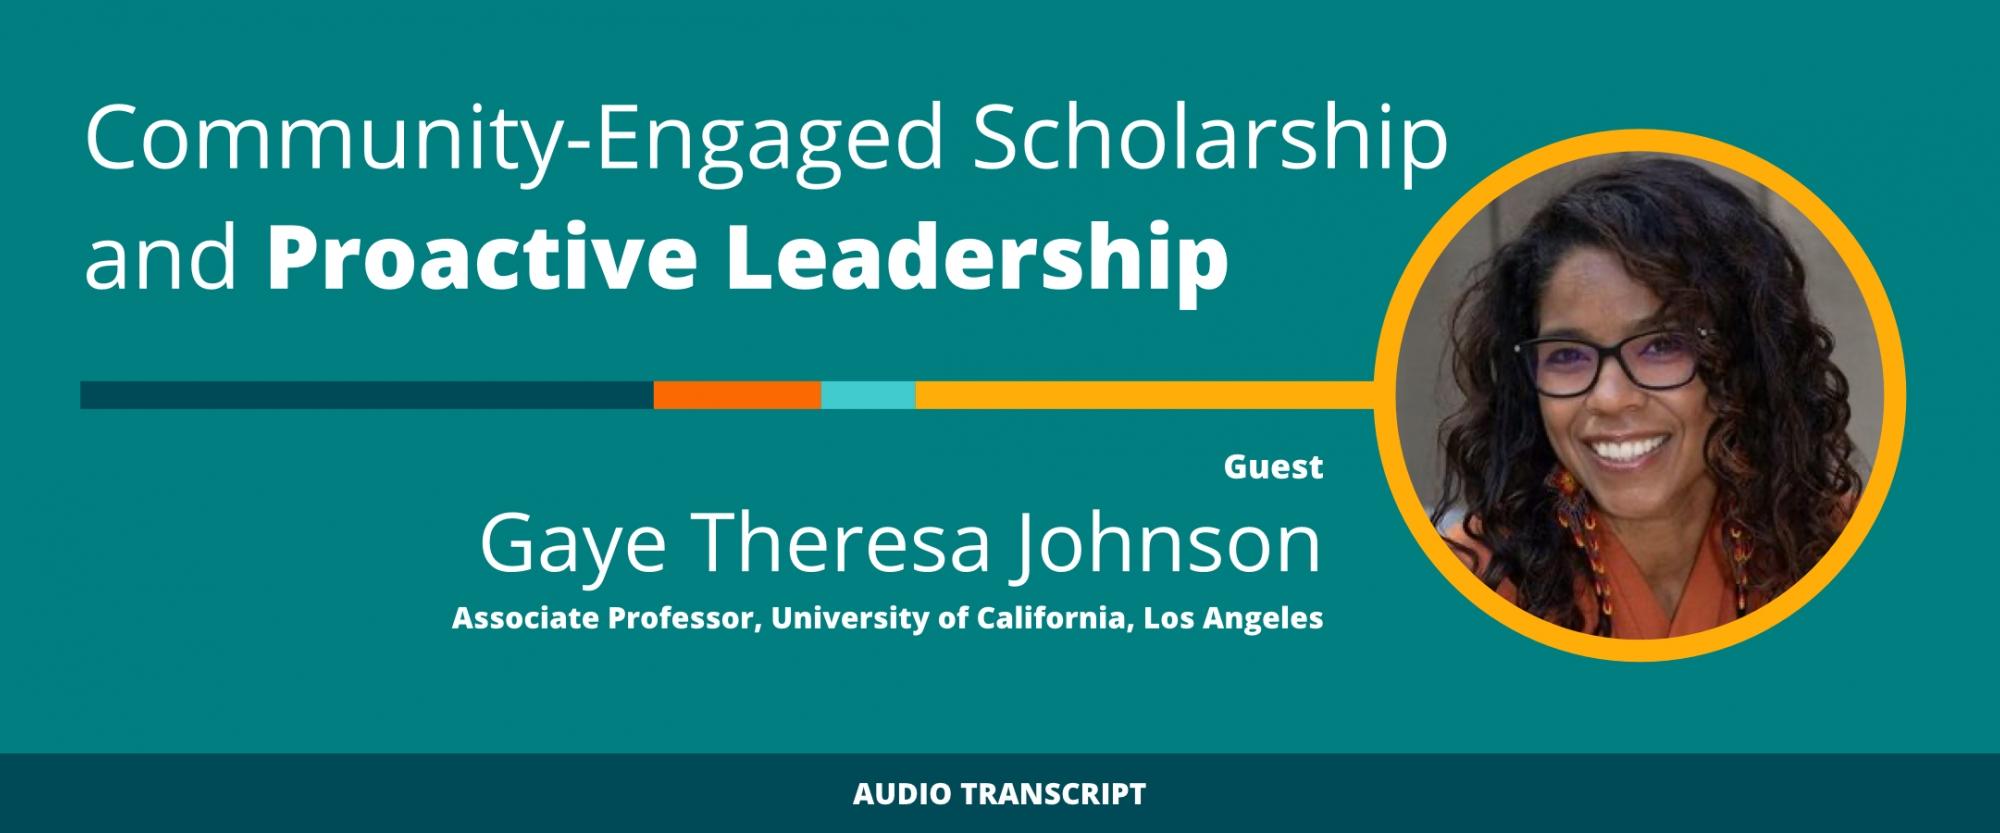 Scholarship to Practice 3/25/21: Transcript of Conversation With Gaye Theresa Johnson, Associate Professor, University of California, Los Angeles